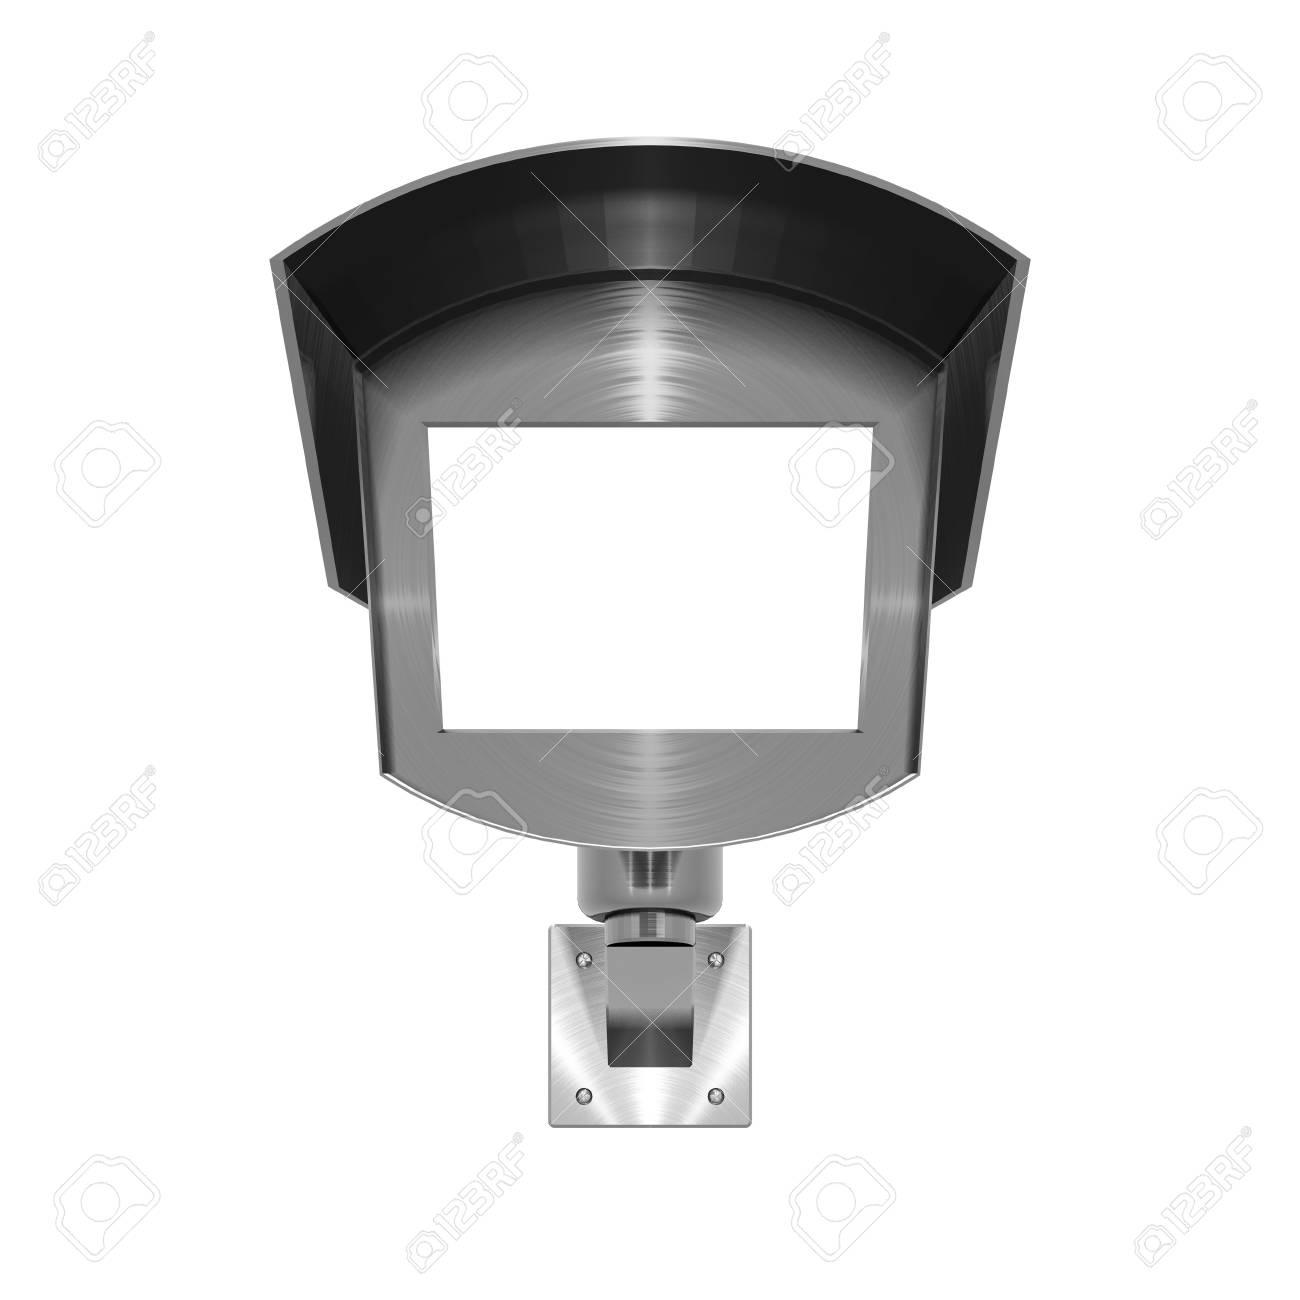 3D illustration of metallic, brushed steel effect CCTV camera on white background - 5875877